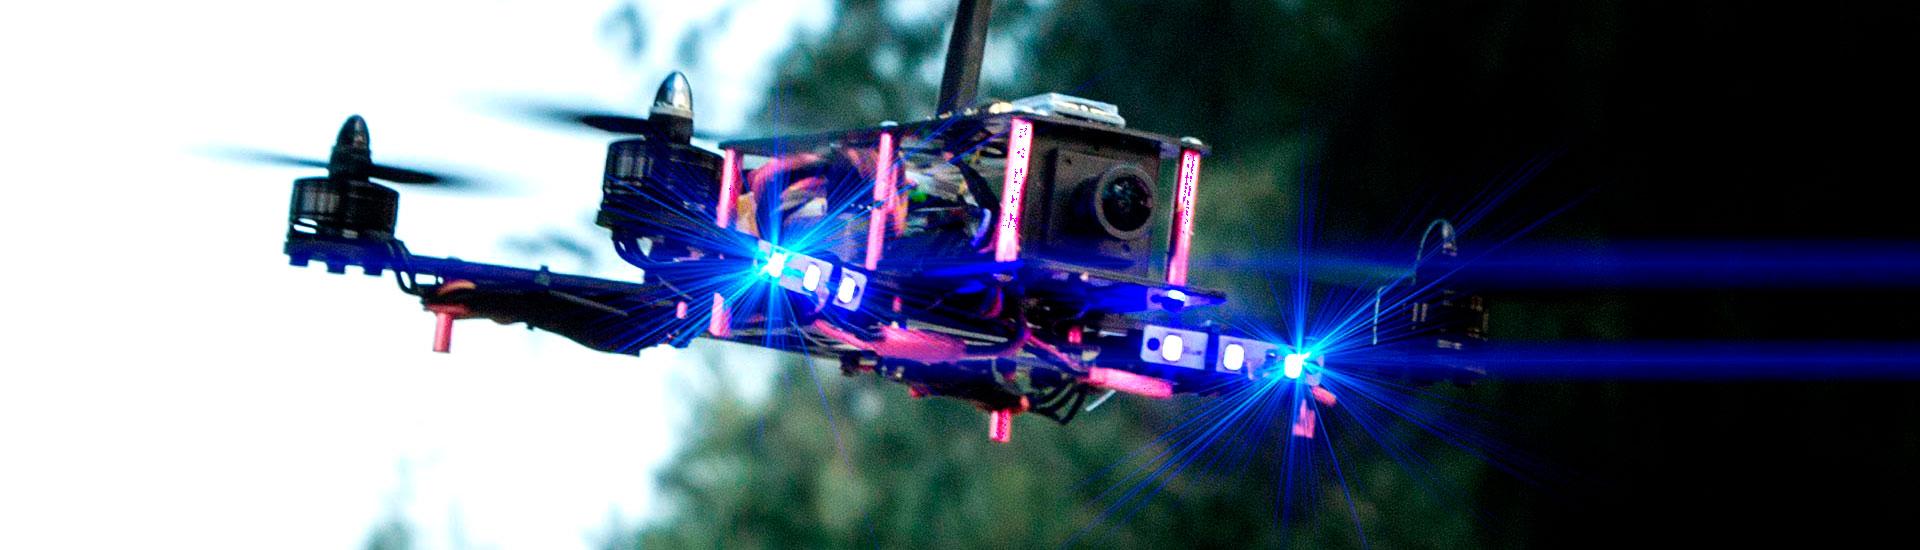 FPV-dron1